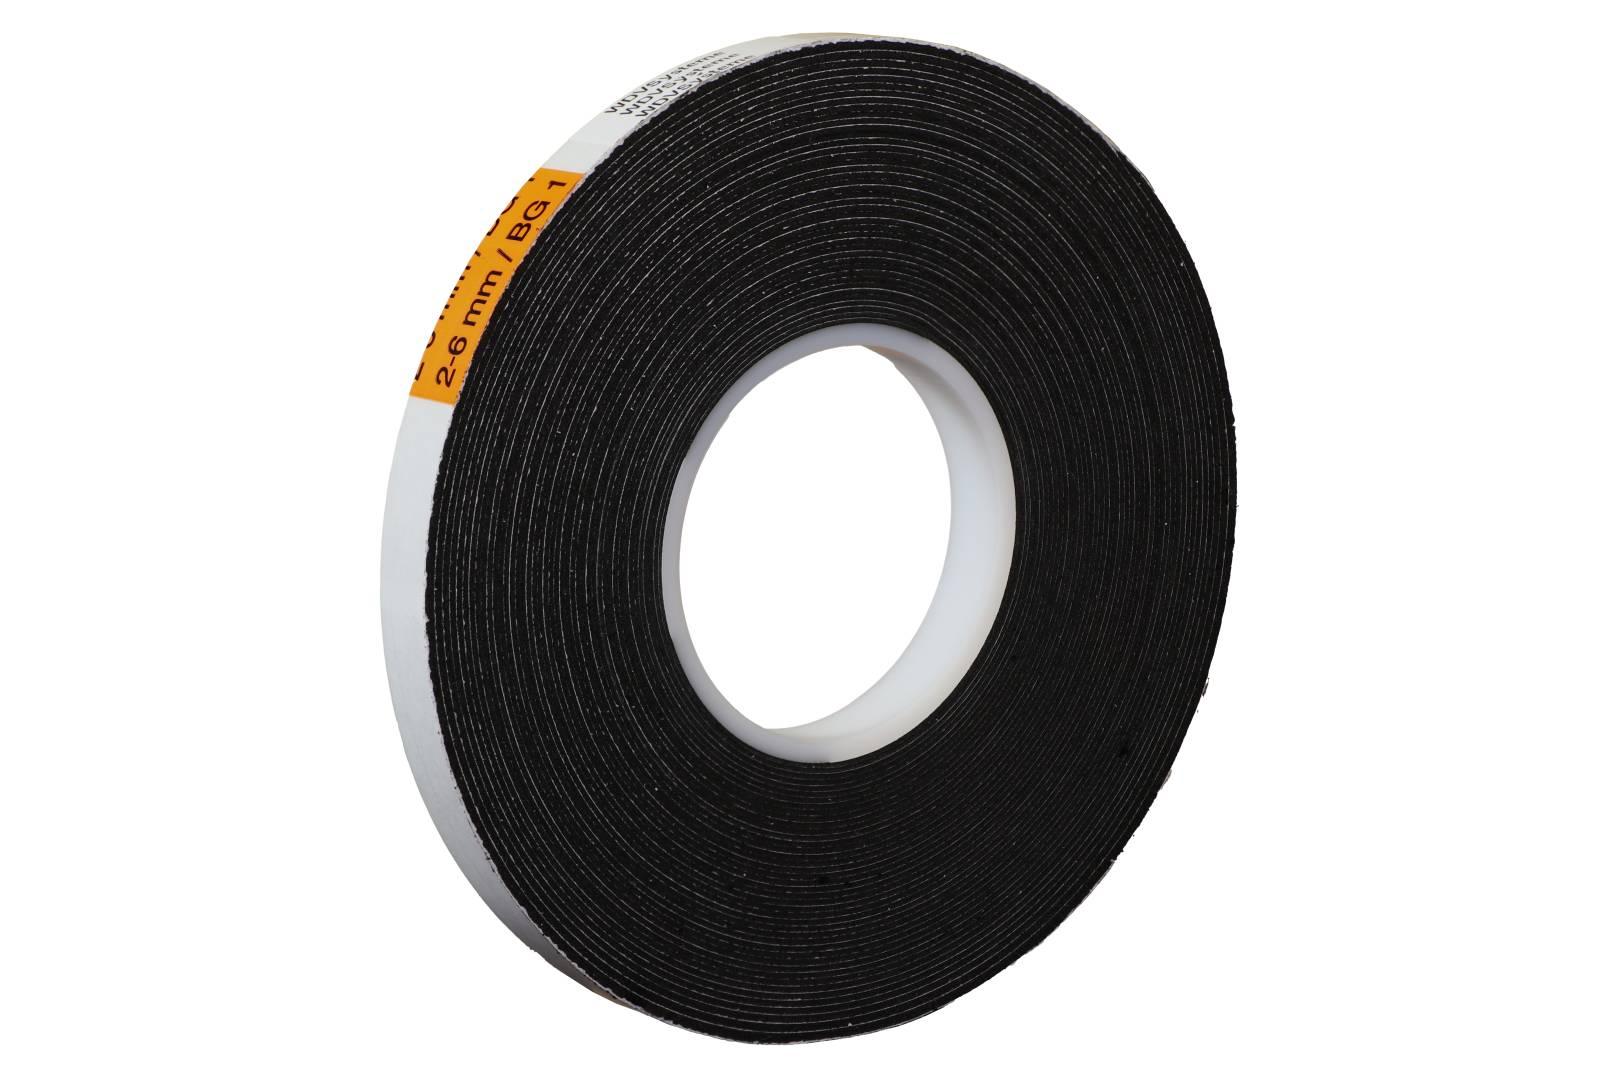 weber.therm Fugendichtband 2D 15/2-6, Breite 15 mm, Stärke 2-6 mm, Länge: 18 m, 1 Rolle